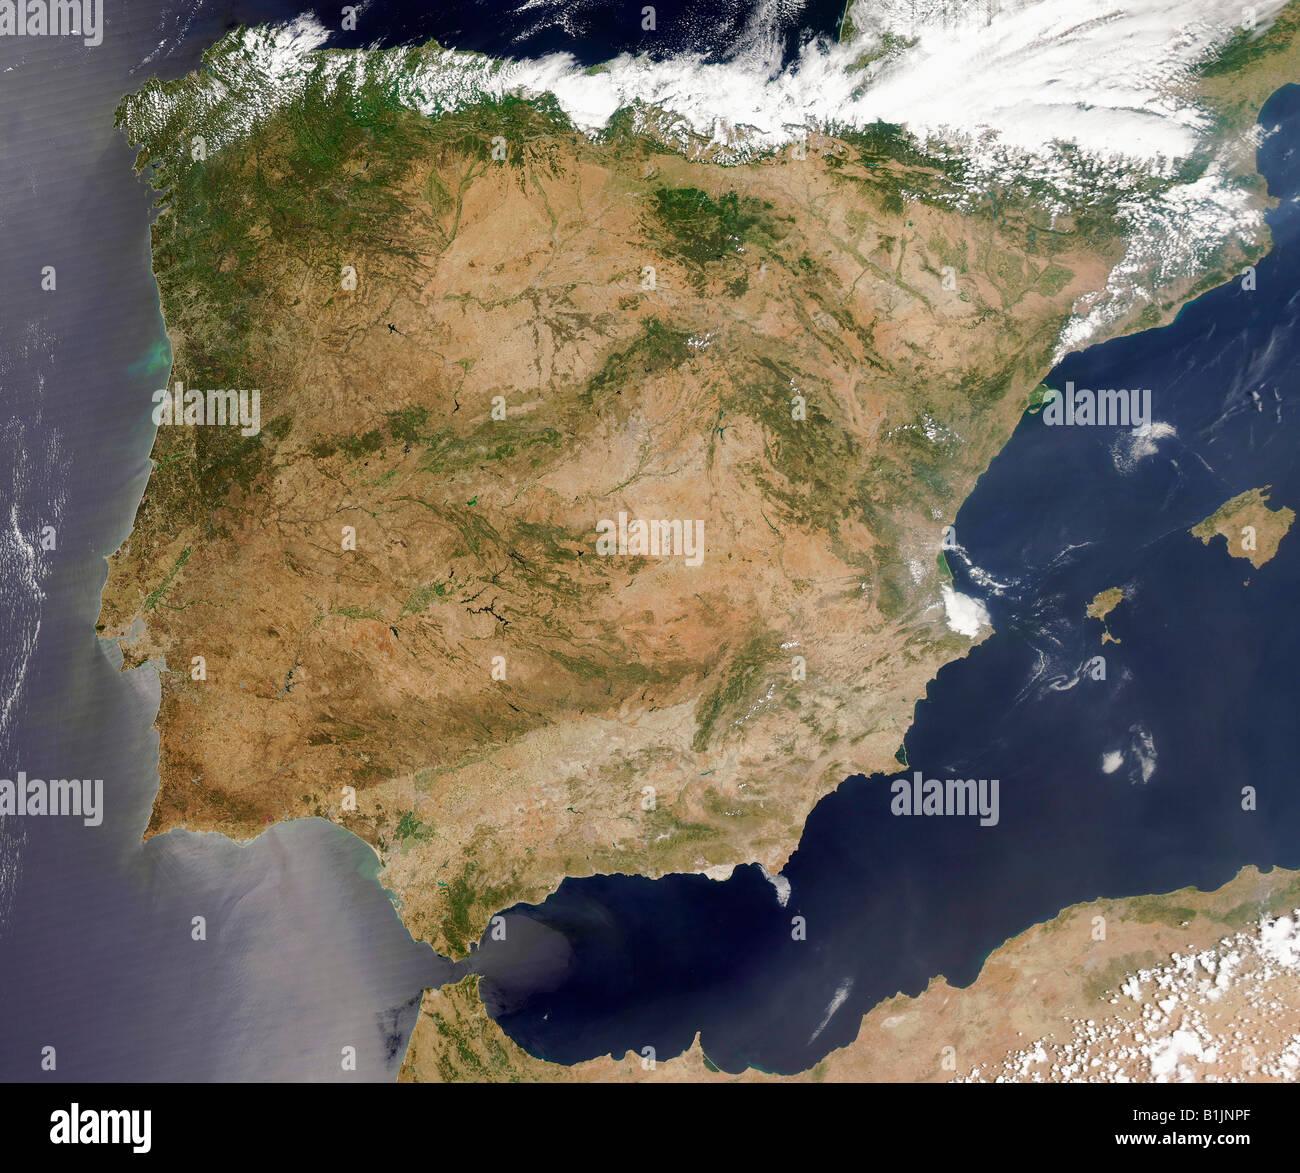 Iberian Peninsula Aerial Satellite Image Stock Photos Iberian - Portugal map satellite